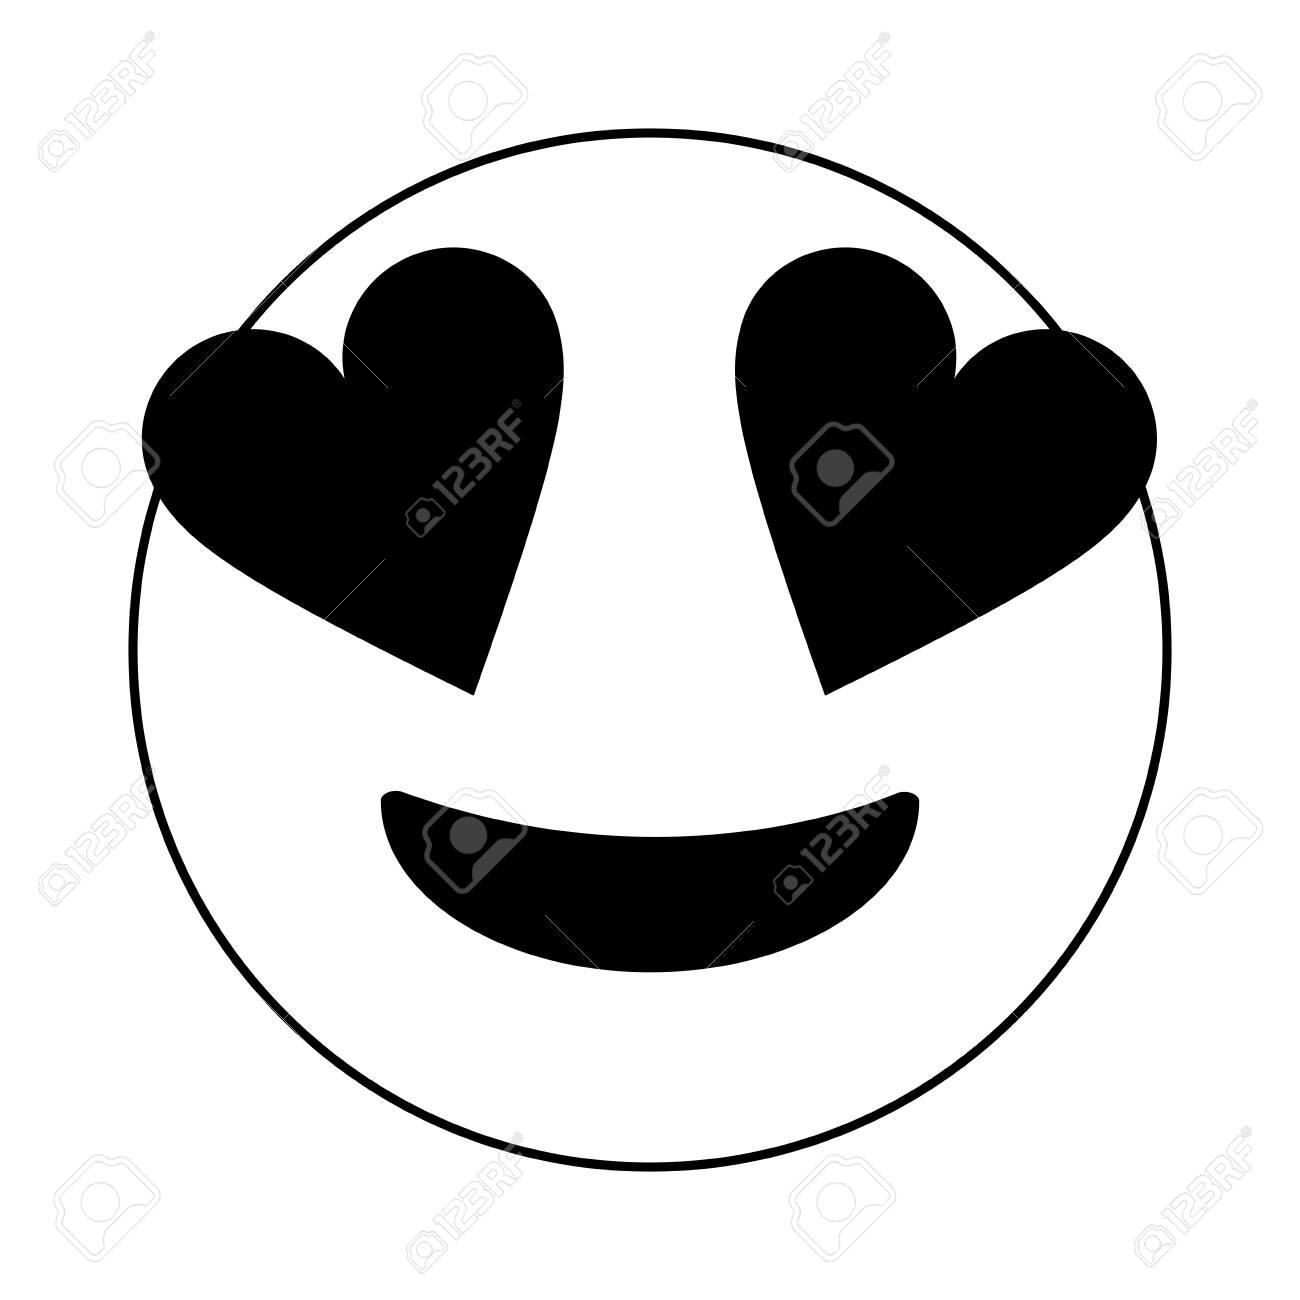 Black and white in love emoji over white background vector illustration.